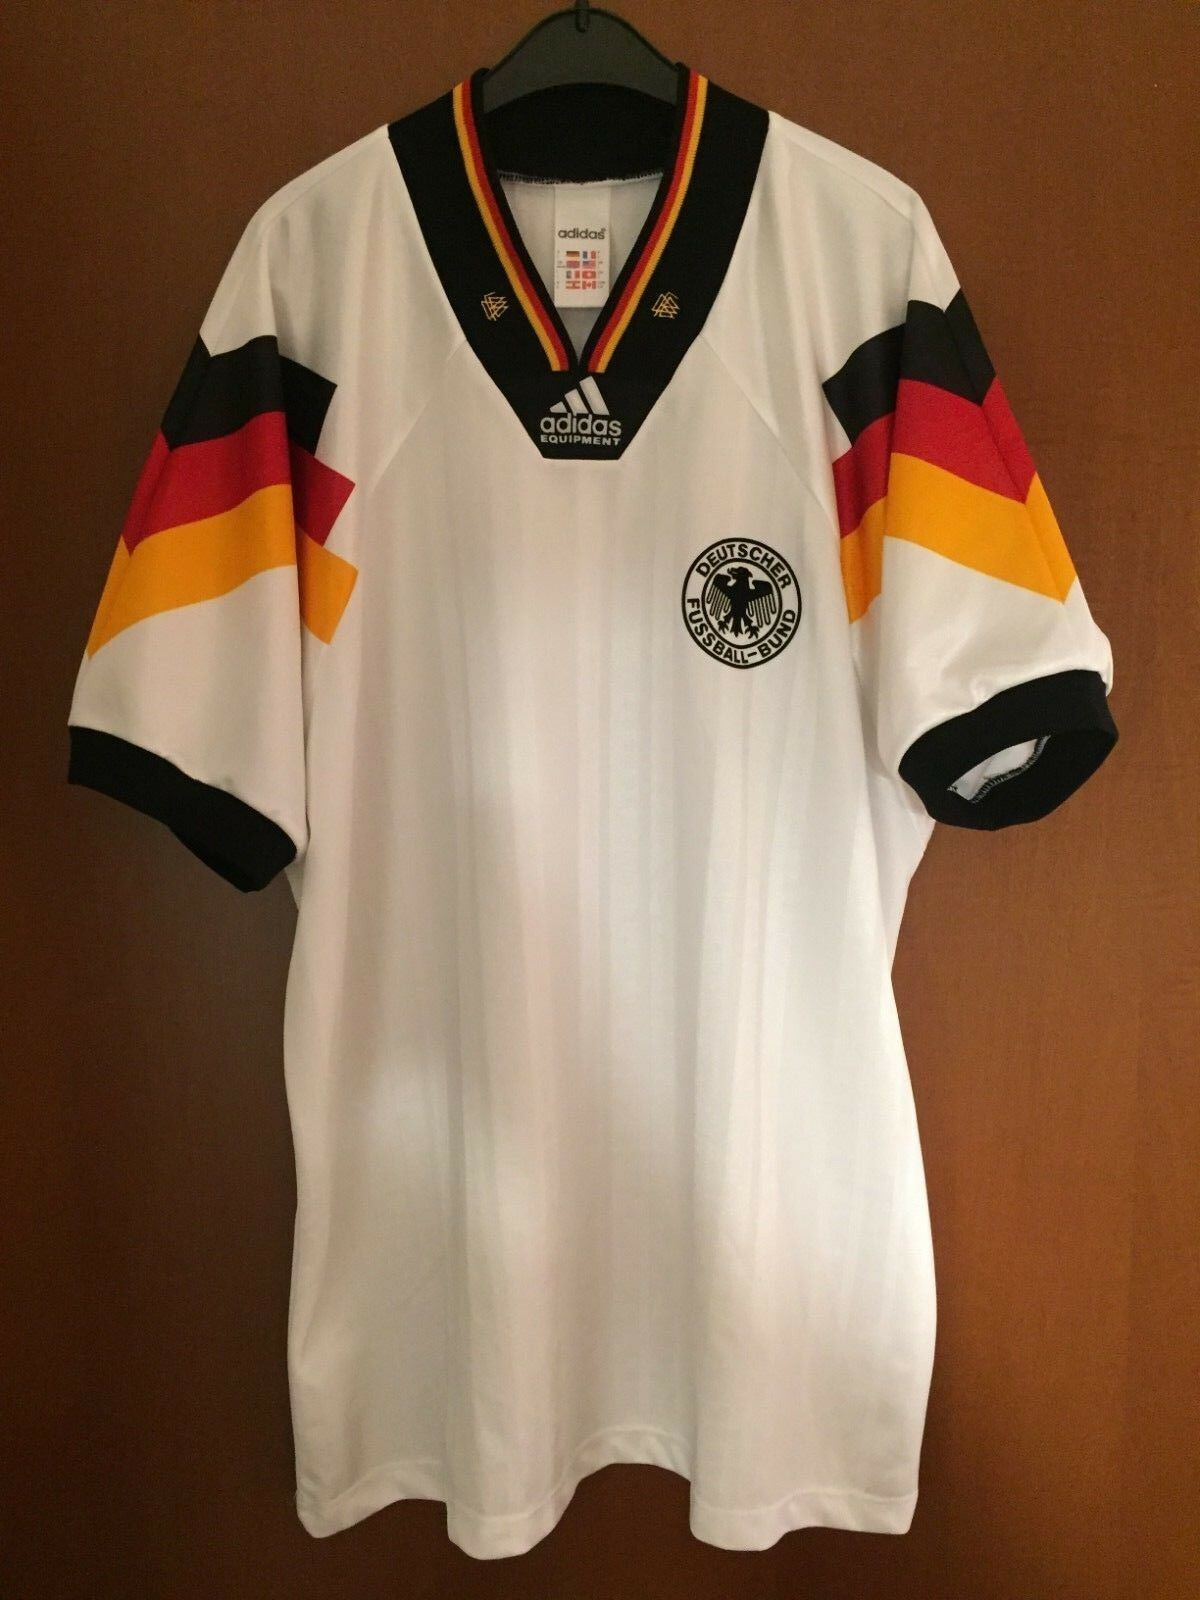 Maglia Shirt Maillot Trikot Camiseta Germania Germany Deutschland Euro 92